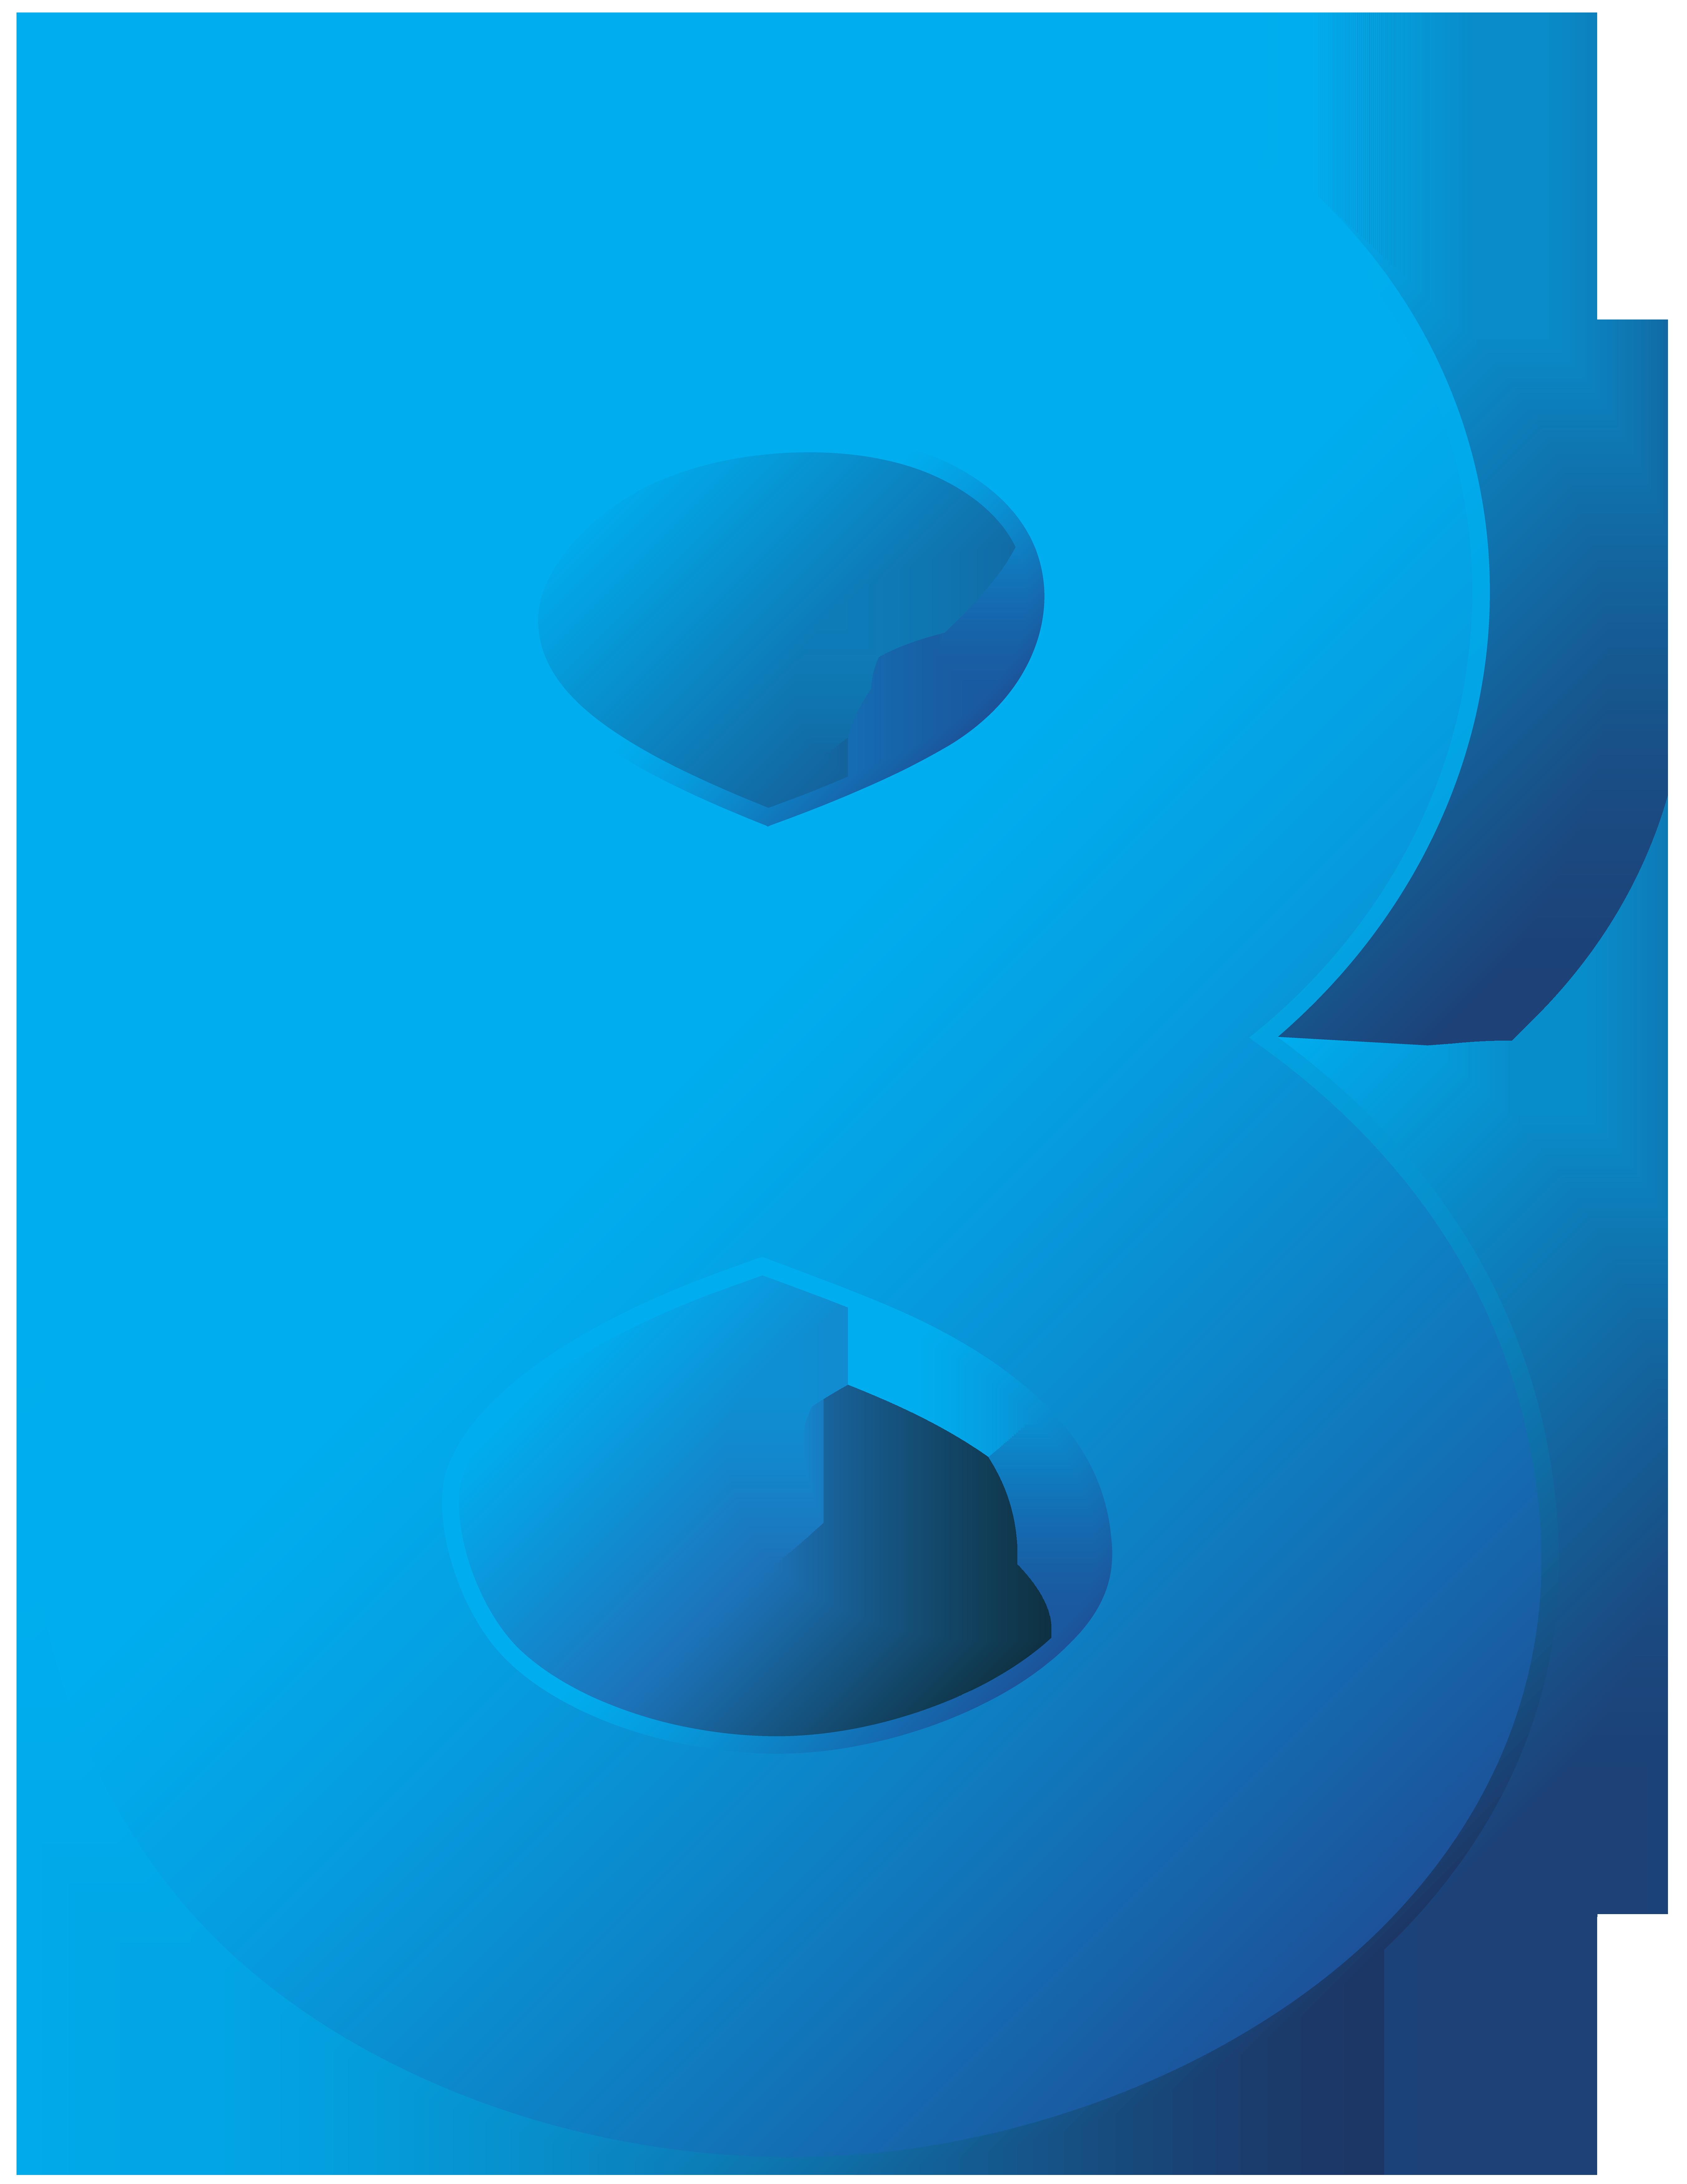 Blue Number Eight Transparent PNG Clip Art Image.